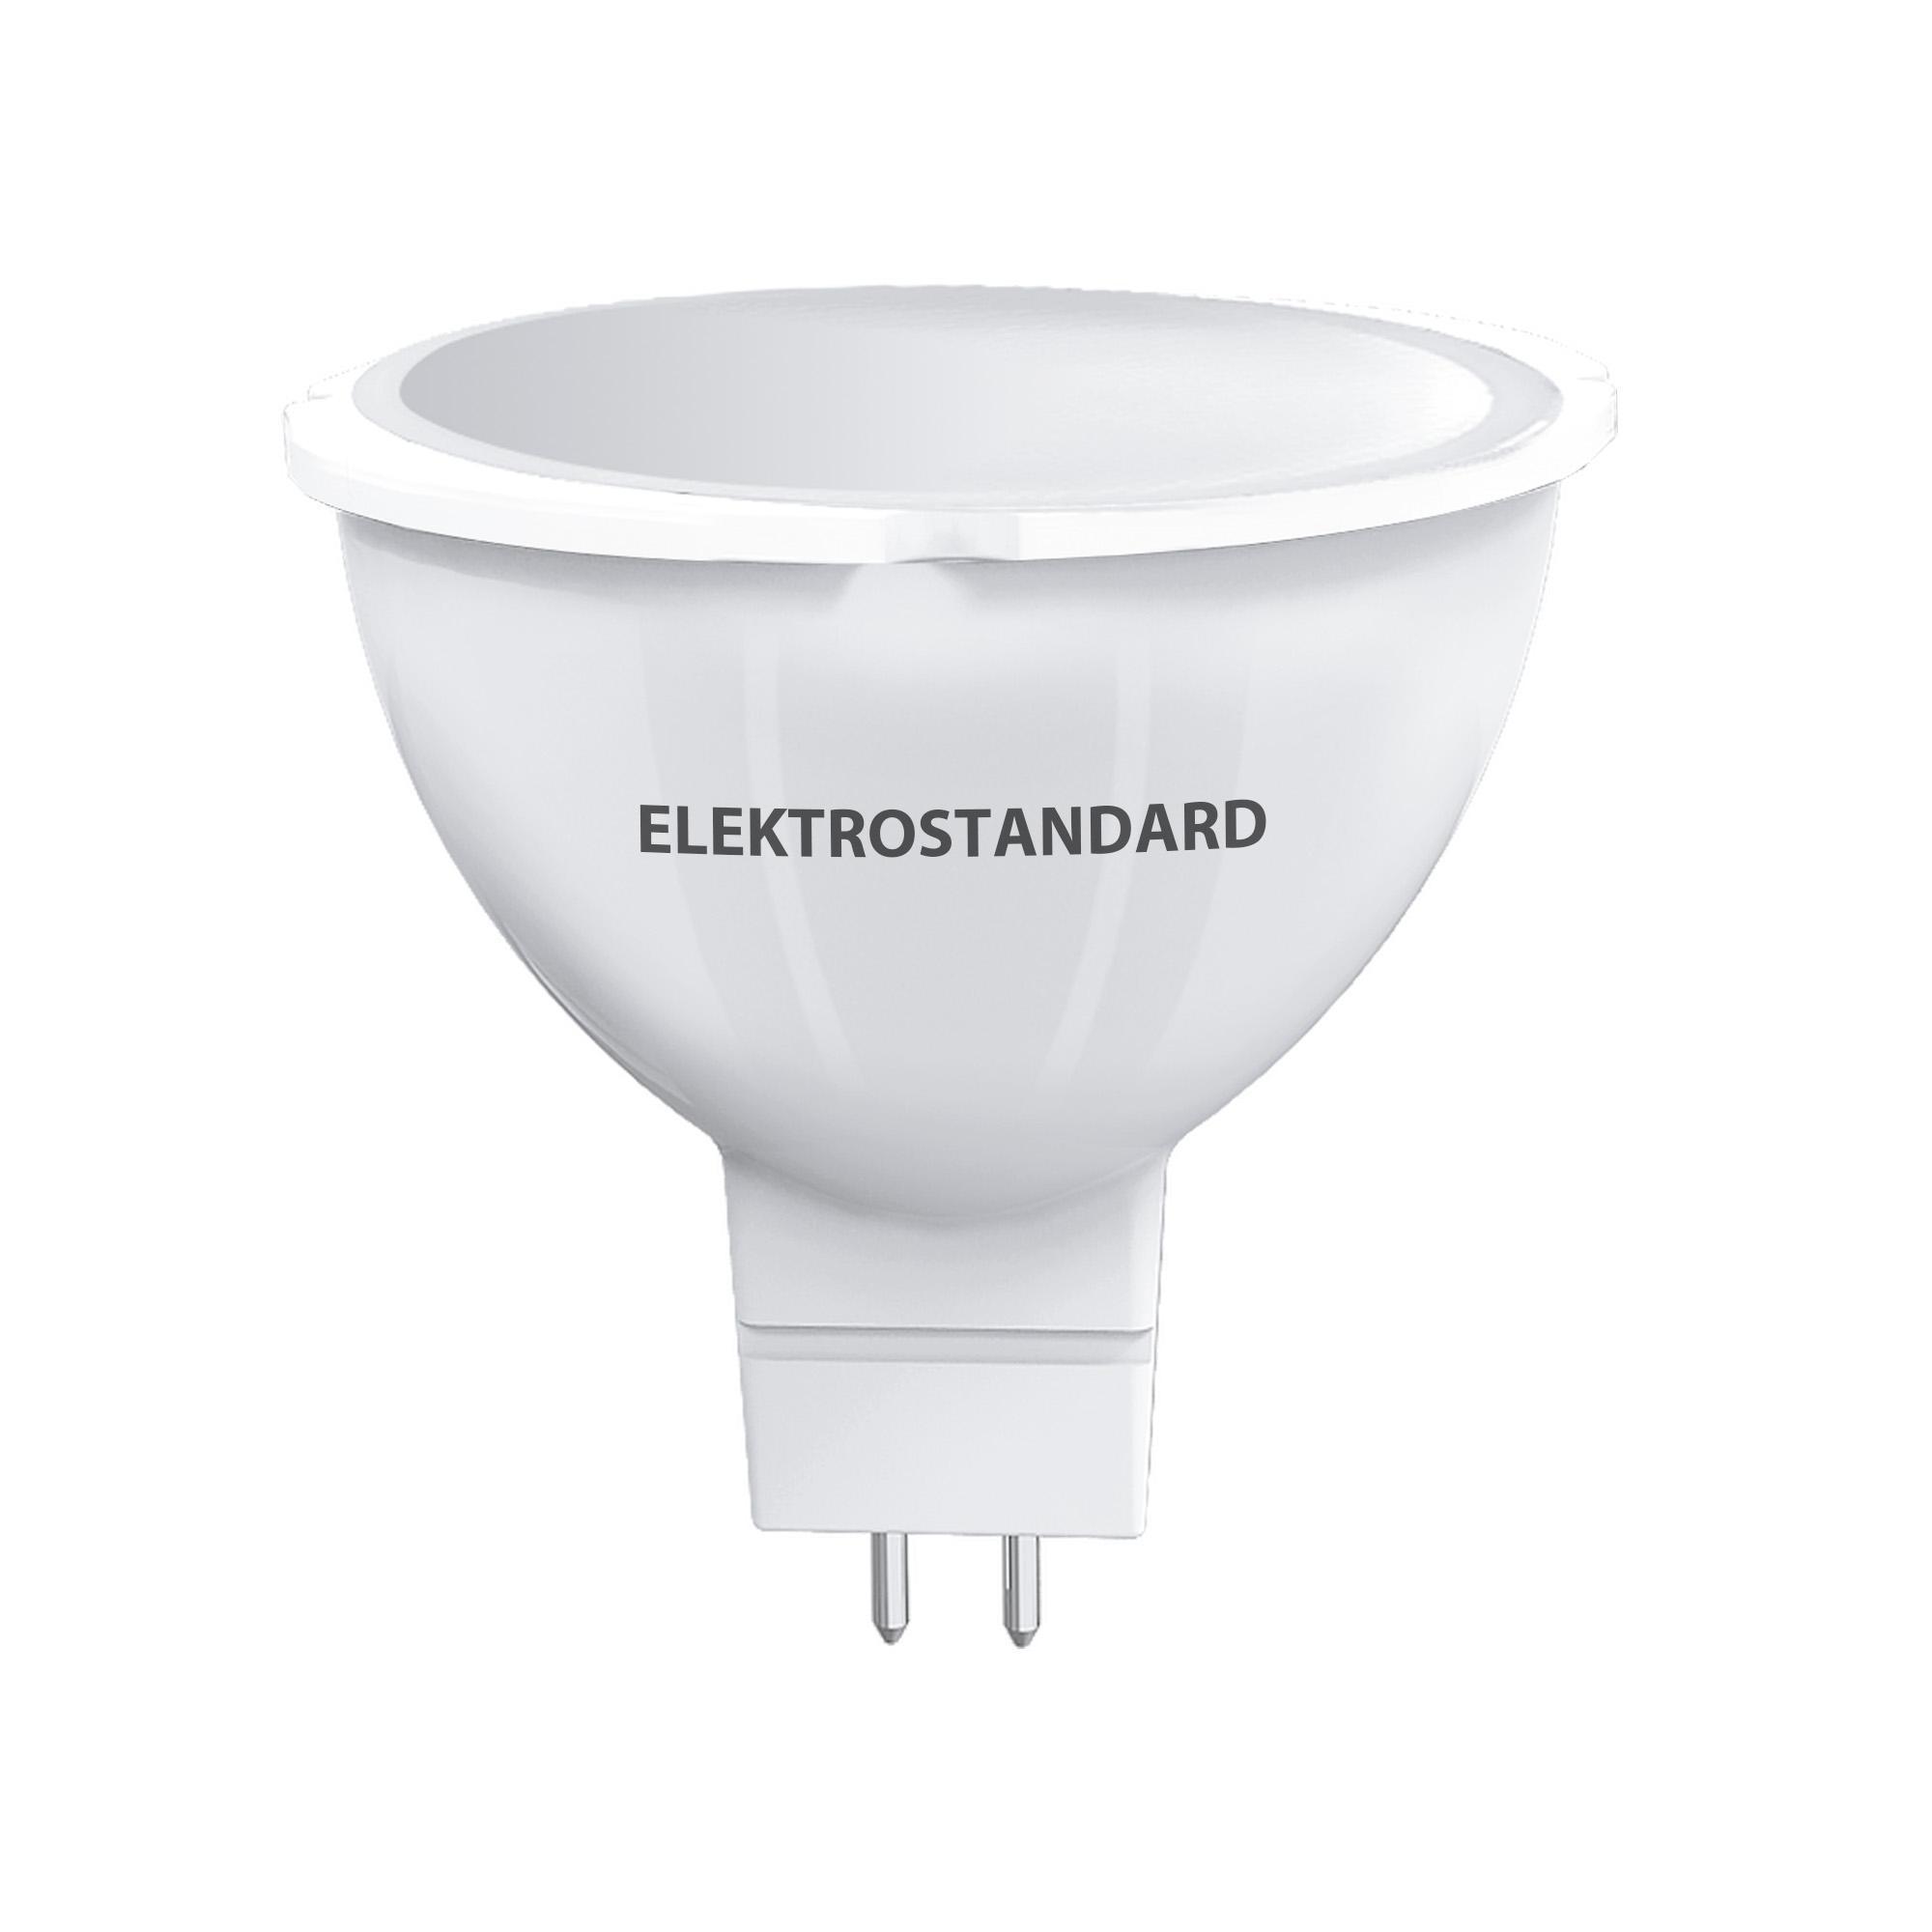 Лампа Electrostandard JCDR01 светодионая G5.3 9 Вт рефлекторная 800 Лм теплый свет